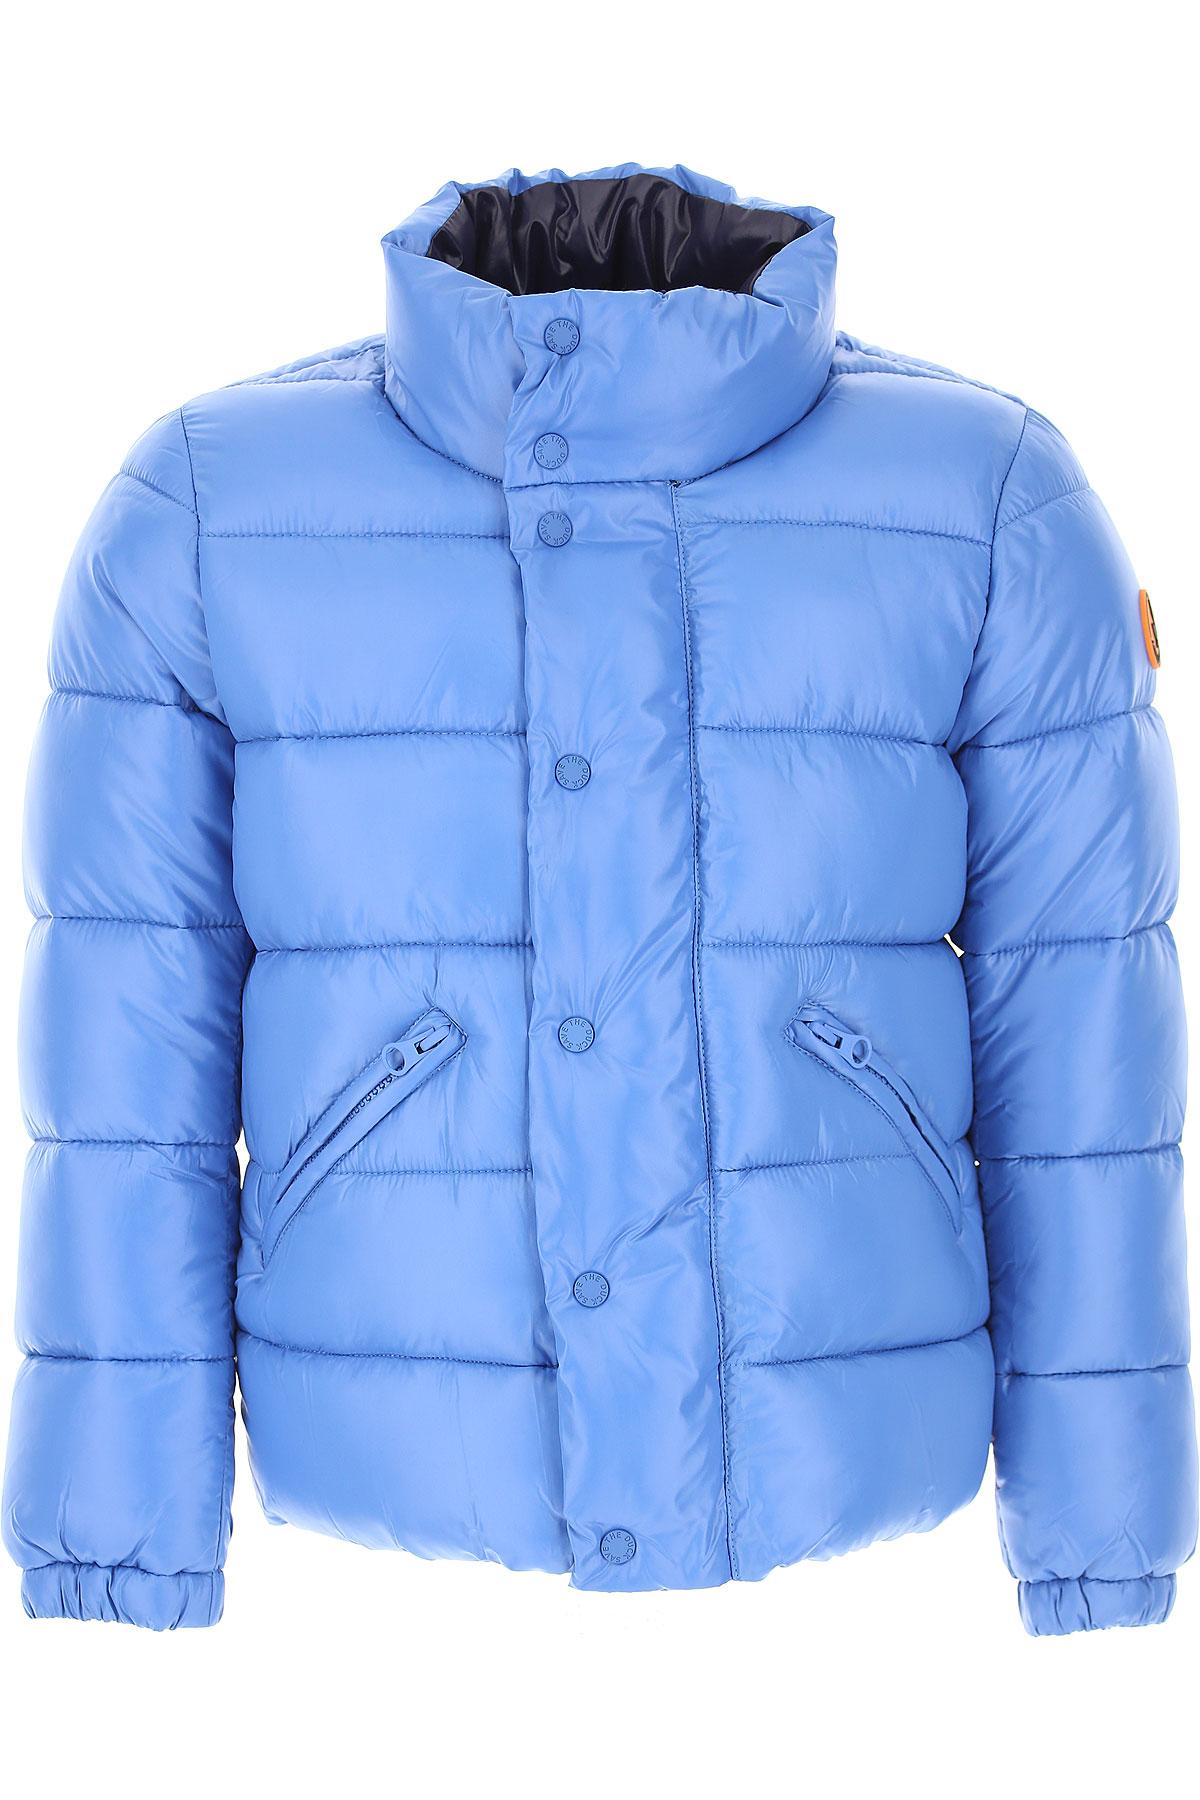 Image of Save the Duck Boys Down Jacket for Kids, Puffer Ski Jacket, iceberg blue, Nylon, 2017, 10Y 4Y 6Y 8Y